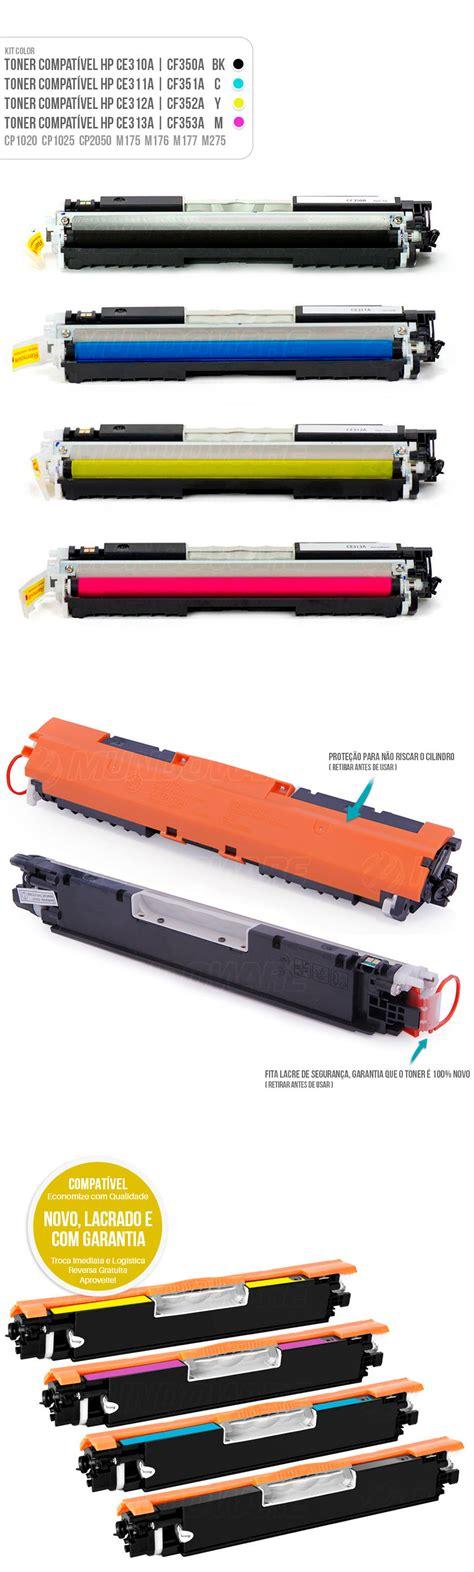 Toner Hp Warna Cf 352a 310 Yellow kit colorido de toner compat 237 vel 126a 130a para hp m176n mundoware